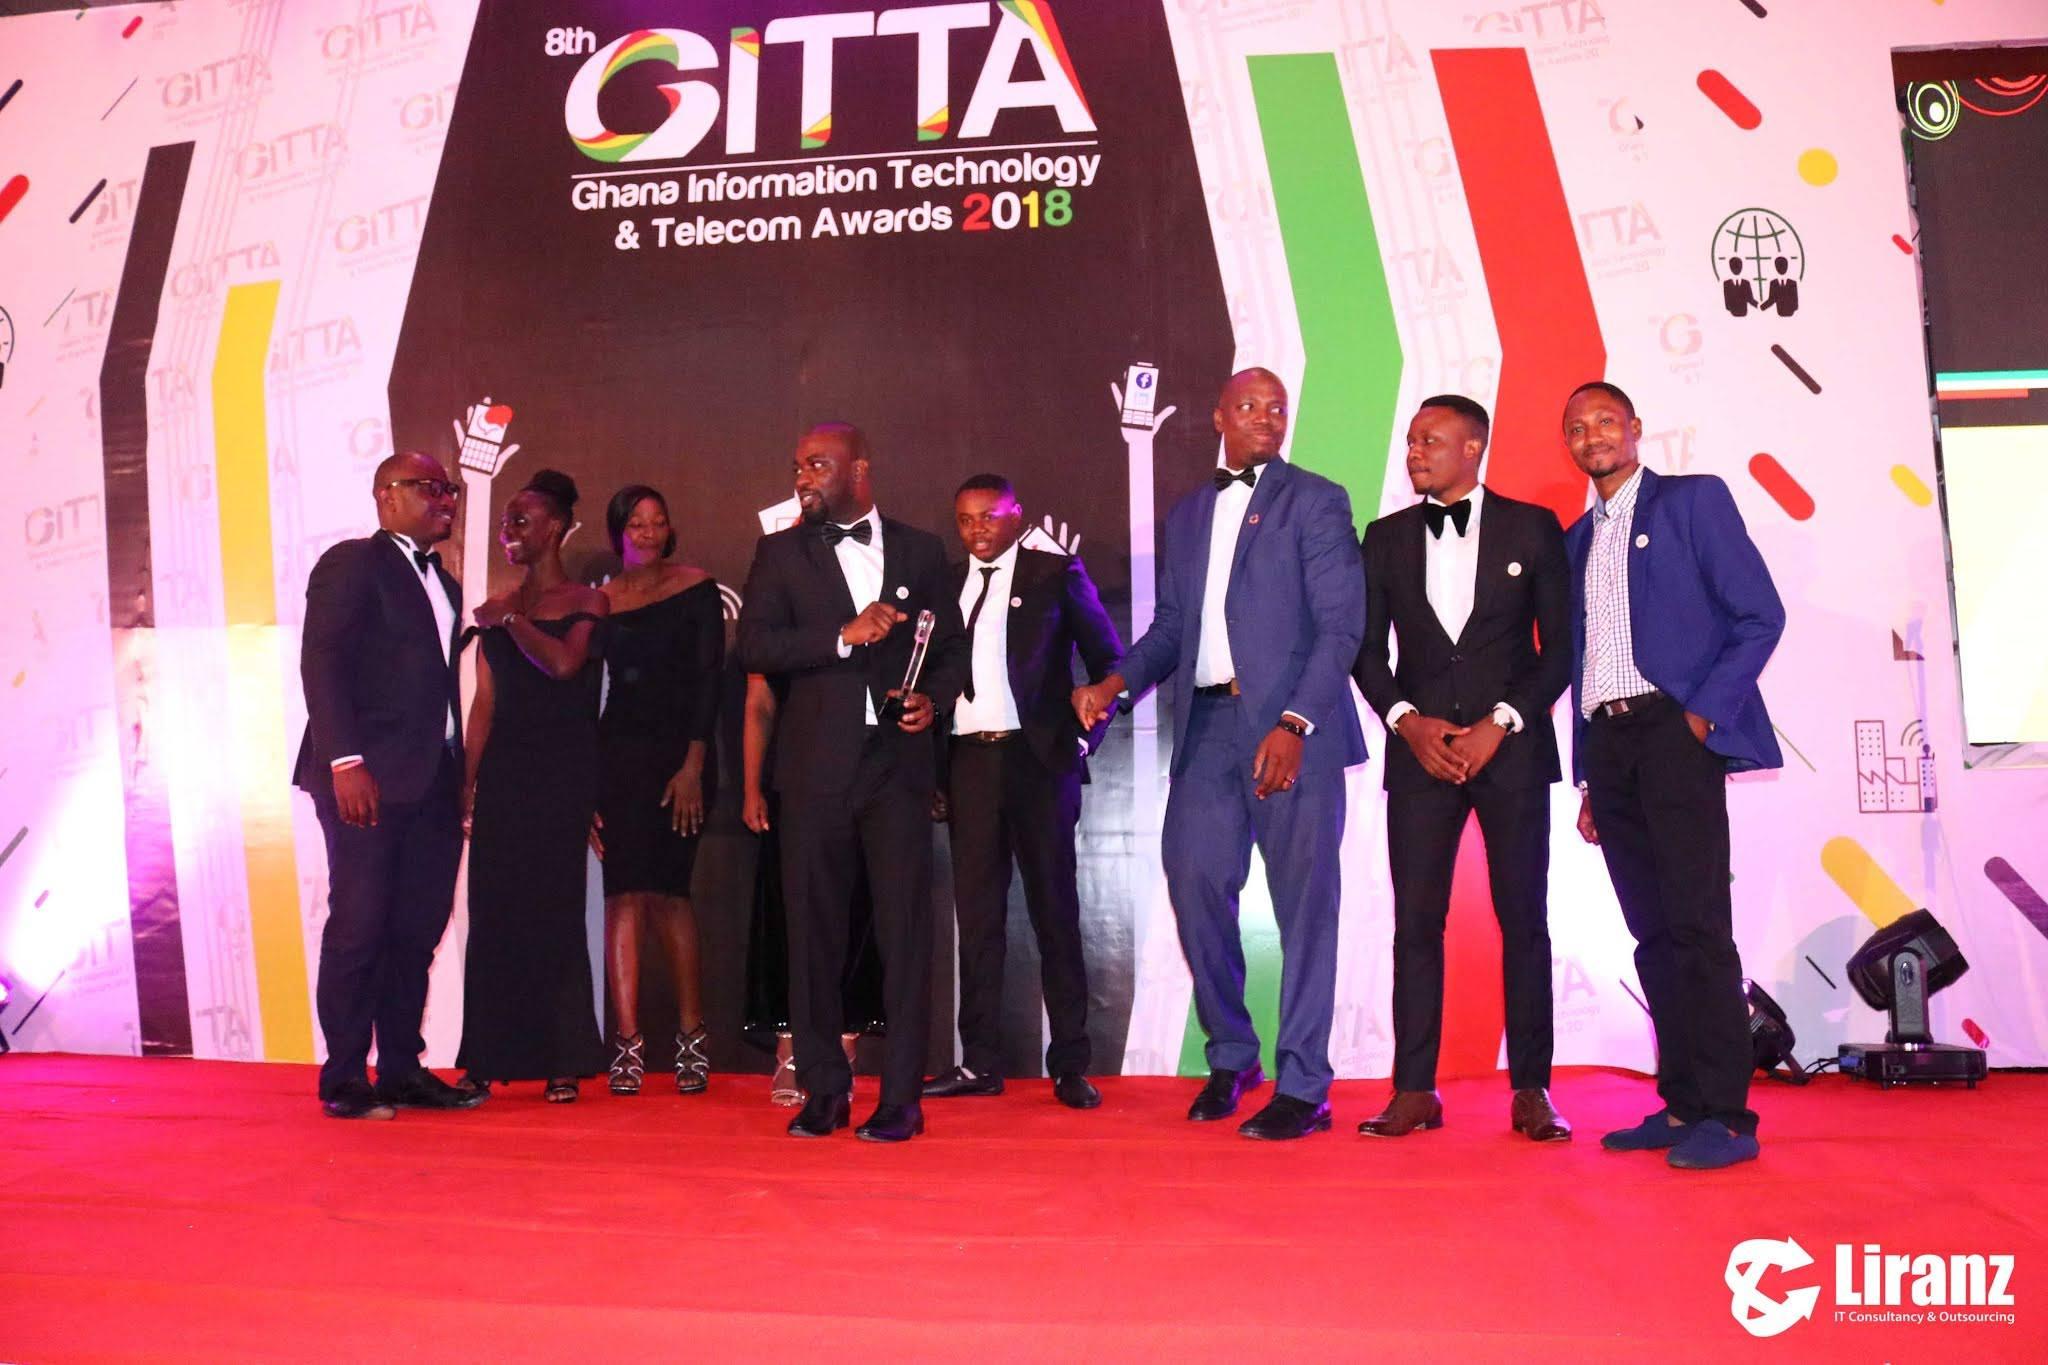 Liranz wins double at the 8th Ghana Information Technology and Telecom Awards (GITTA) 2018